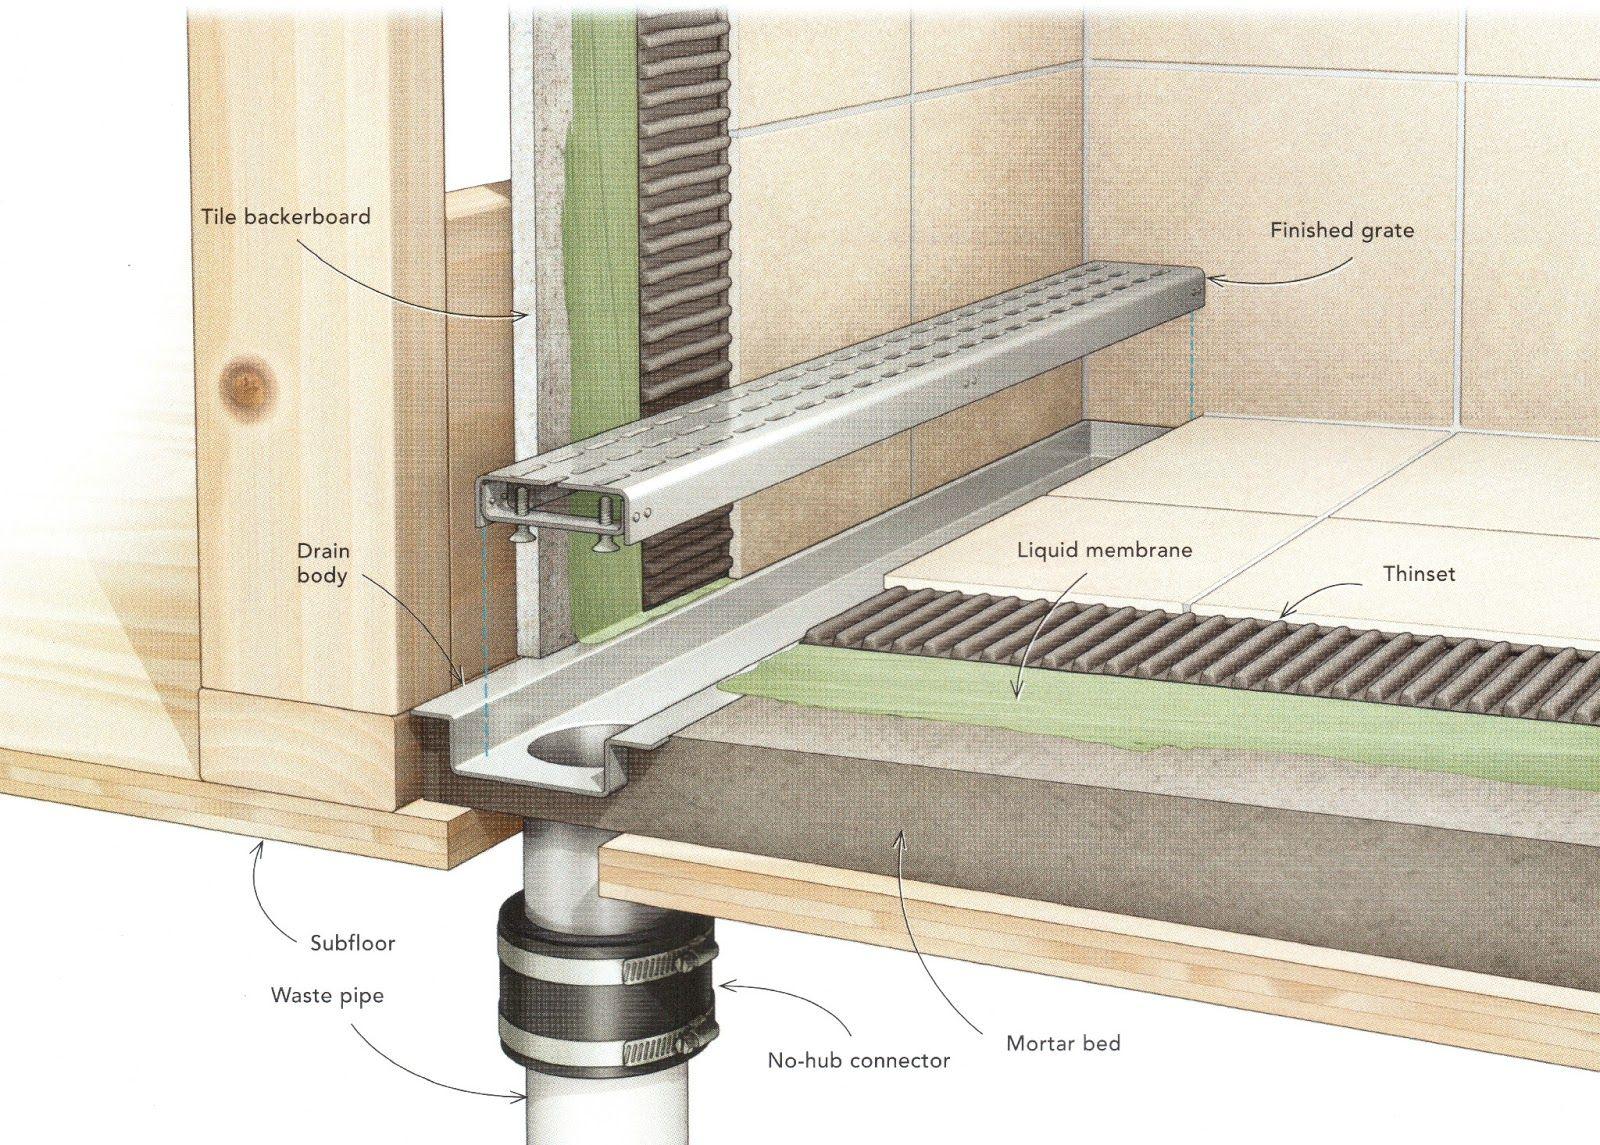 bathroom drainage diagram wiring for 2 way light switch best 25 43 shower drain installation ideas on pinterest